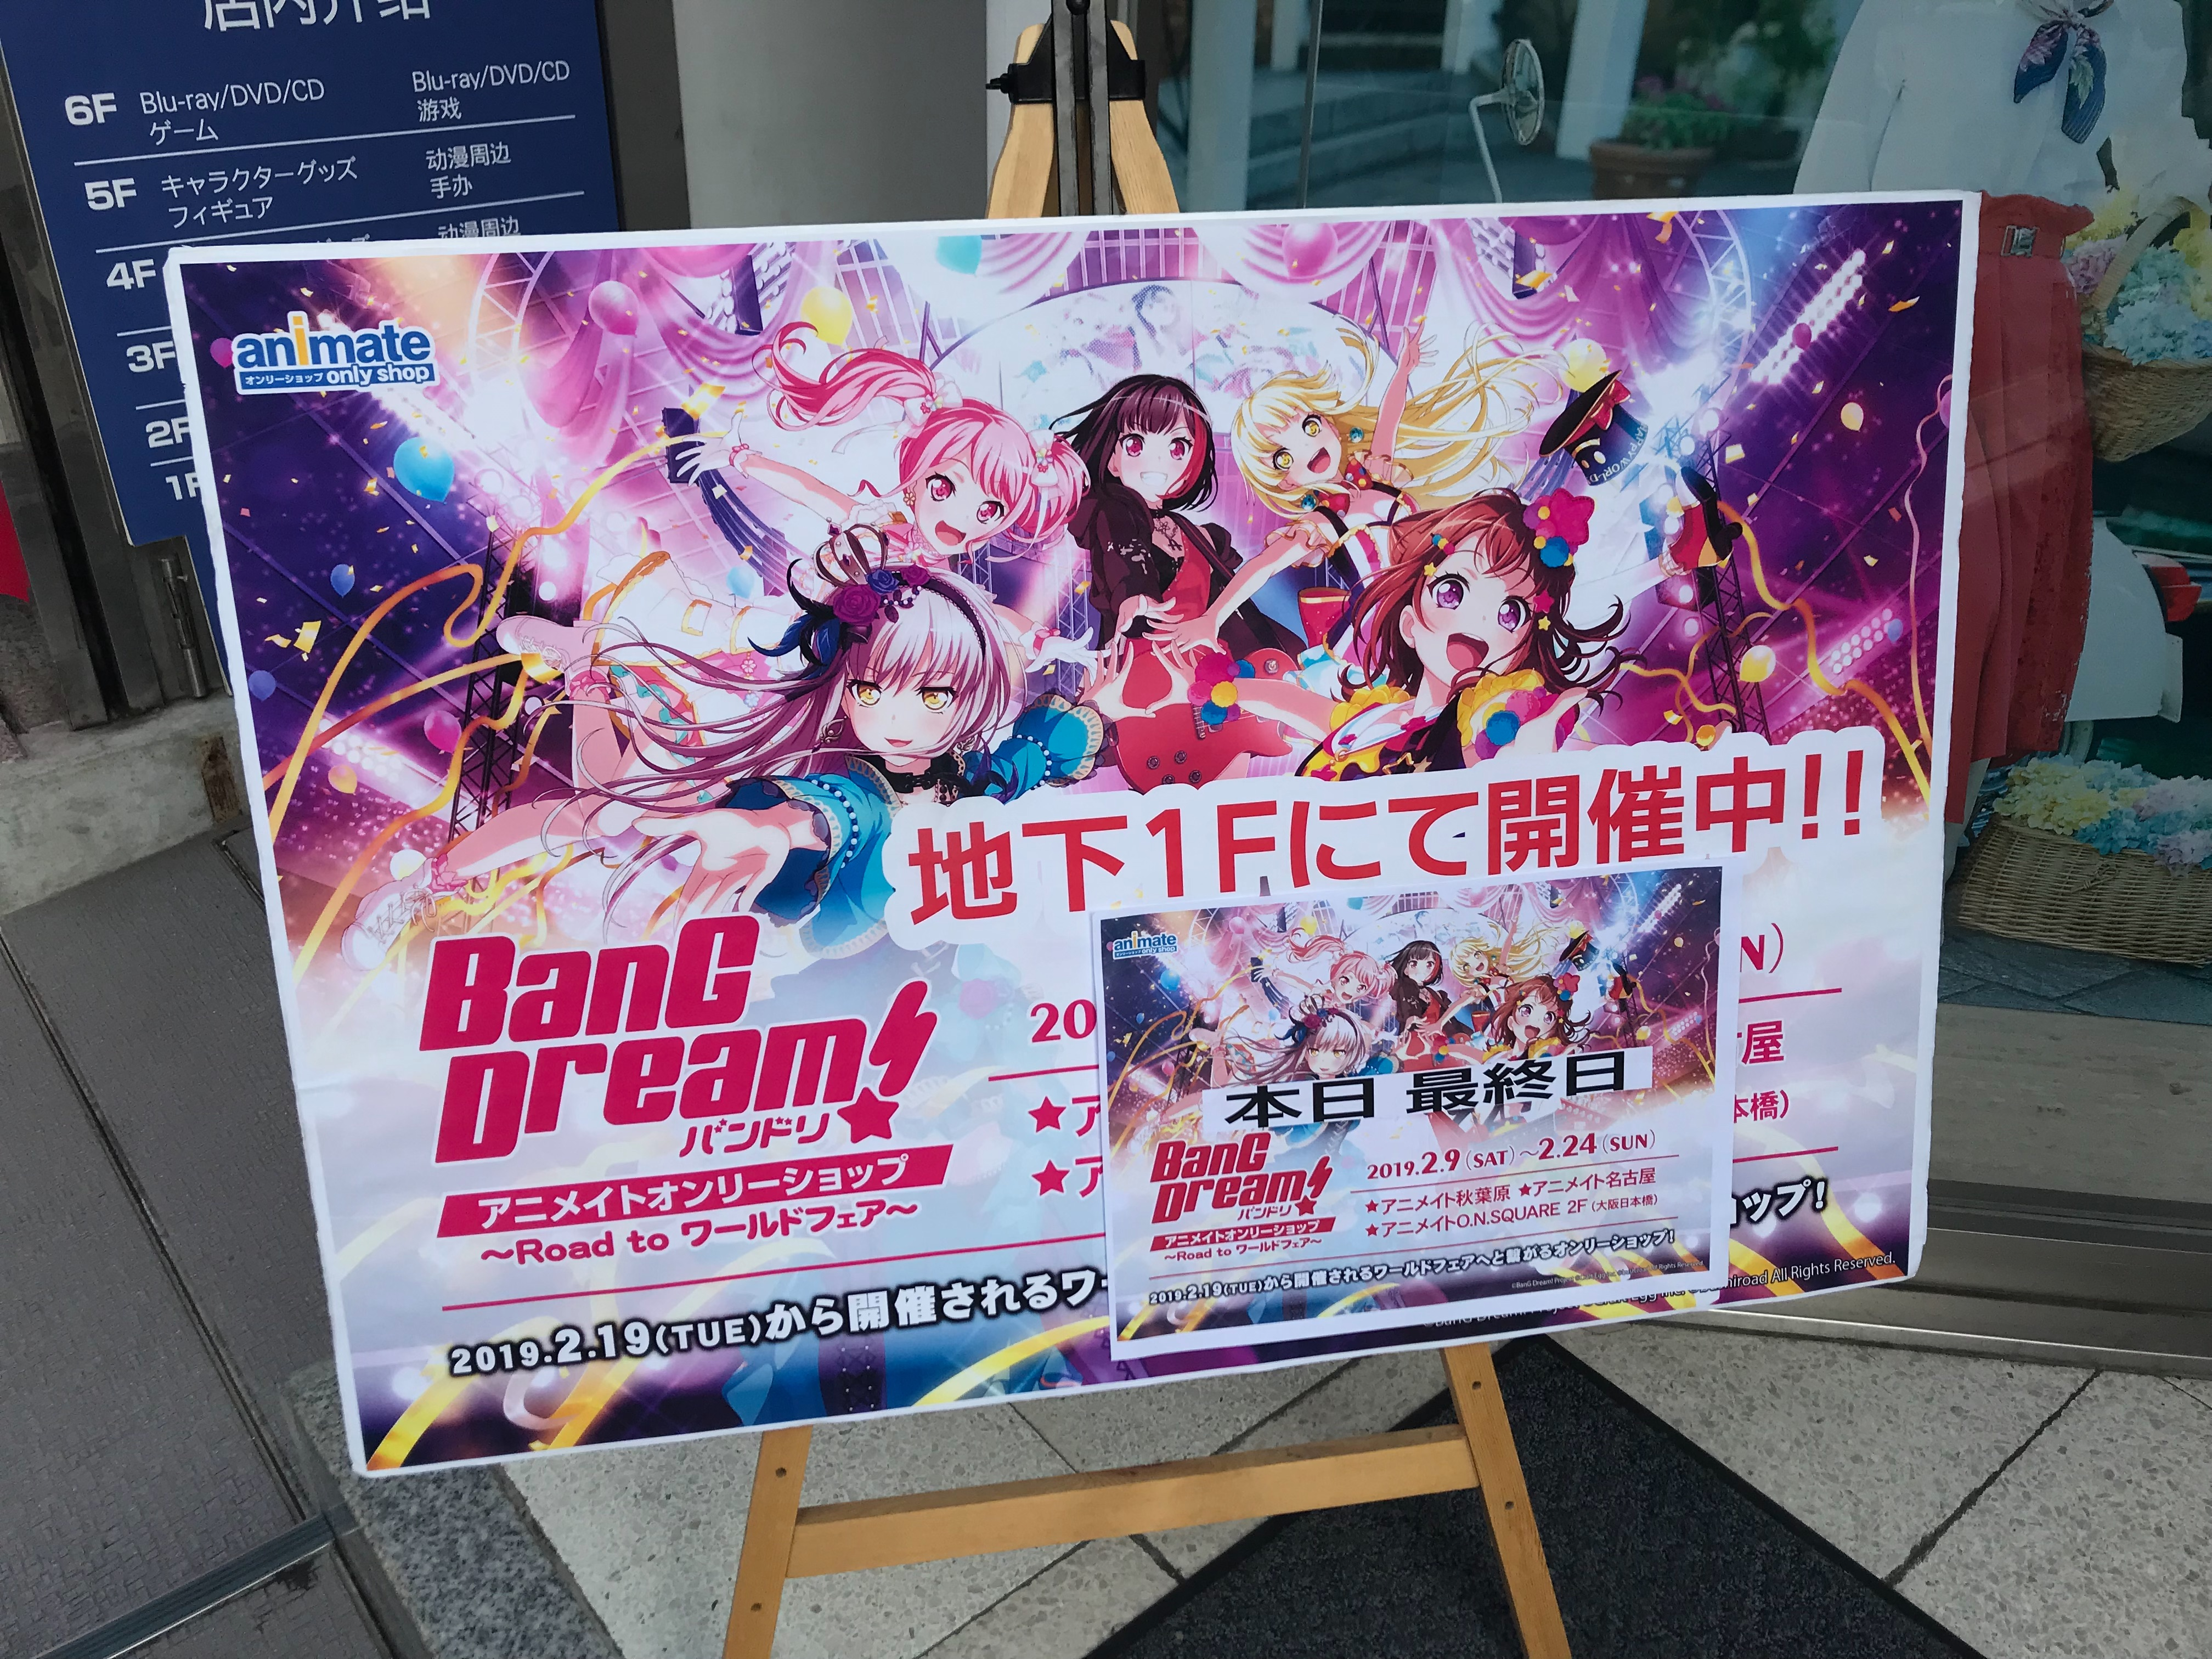 f:id:Nagaoka103:20190224234801j:image